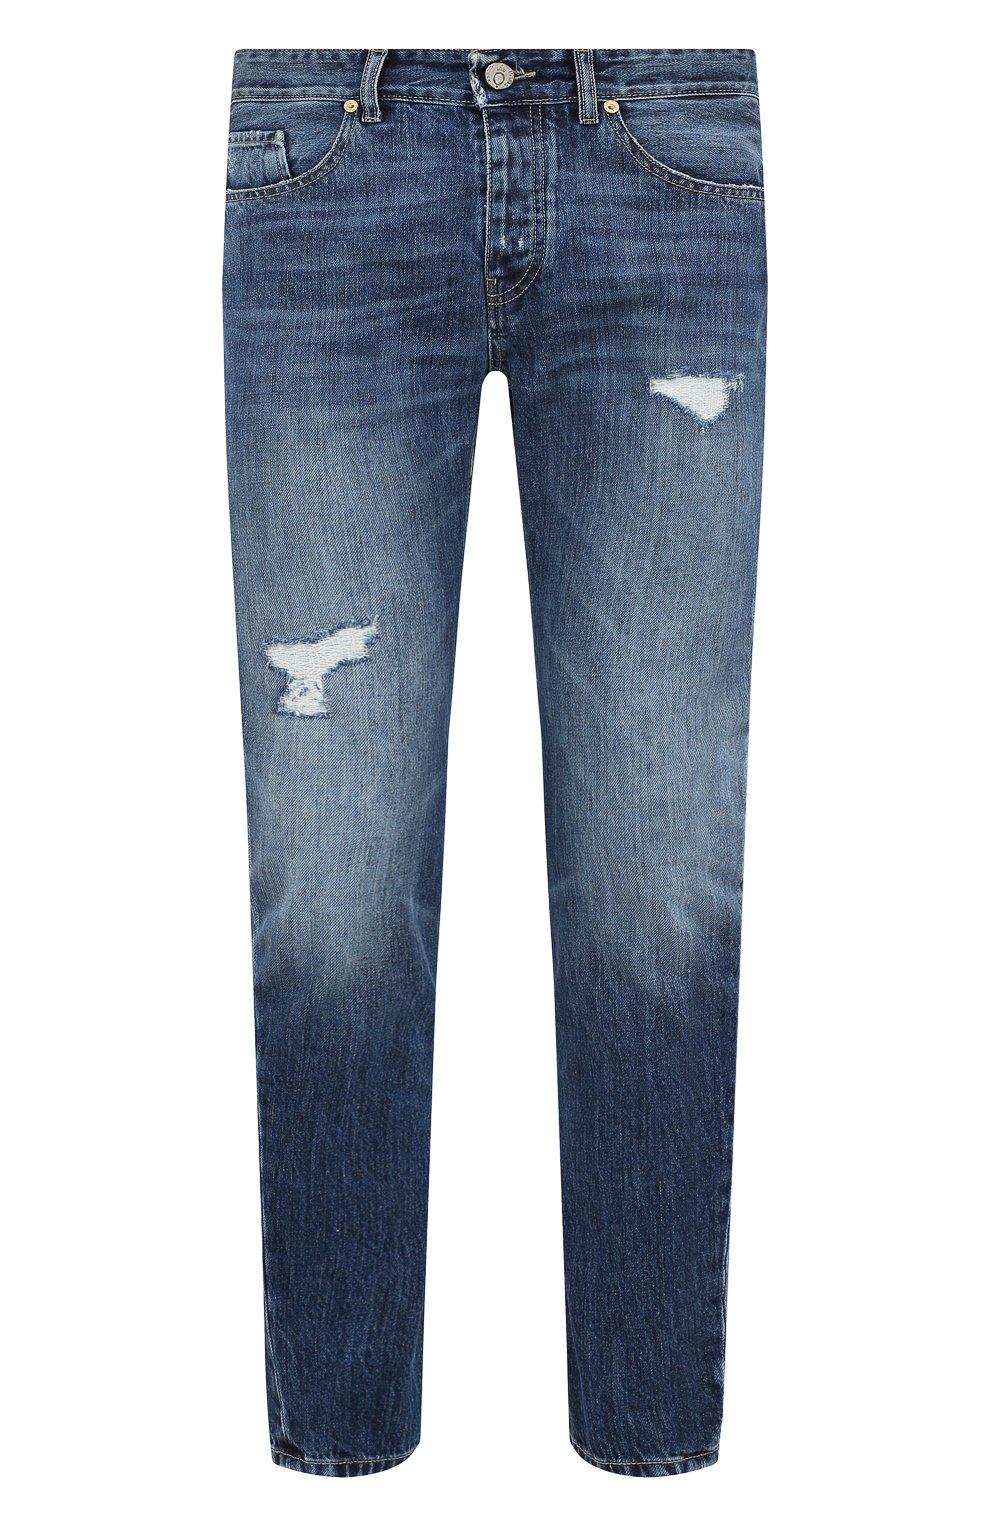 Мужские джинсы PREMIUM MOOD DENIM SUPERIOR синего цвета, арт. F21 352740215/BARRET | Фото 1